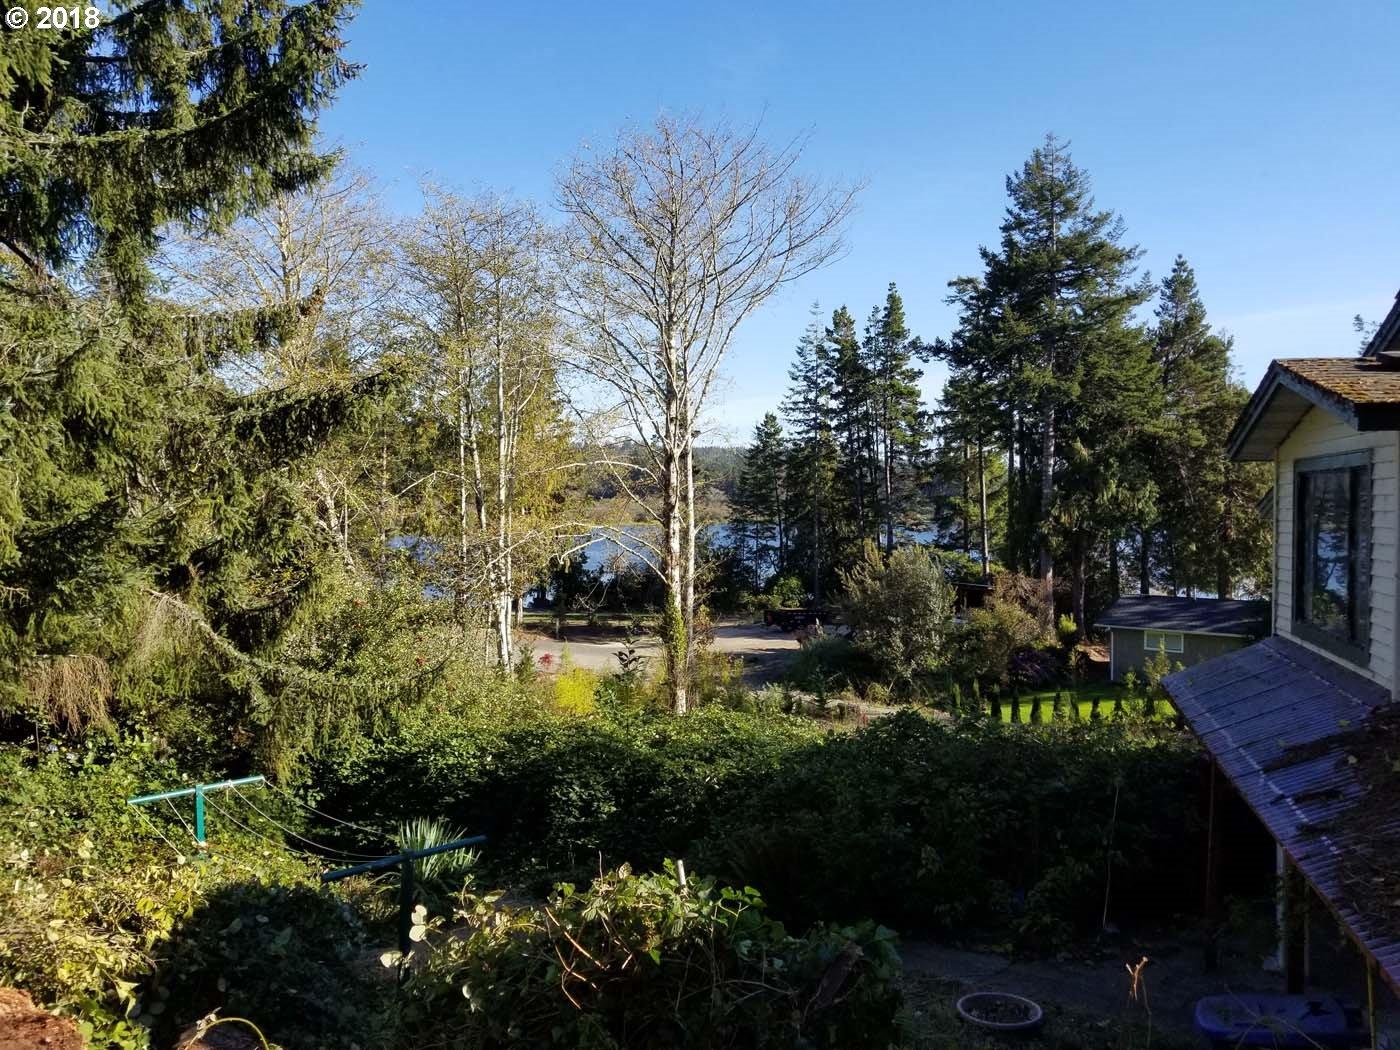 Sutton Lake DR Florence, OR 97439 - MLS #: 18641012